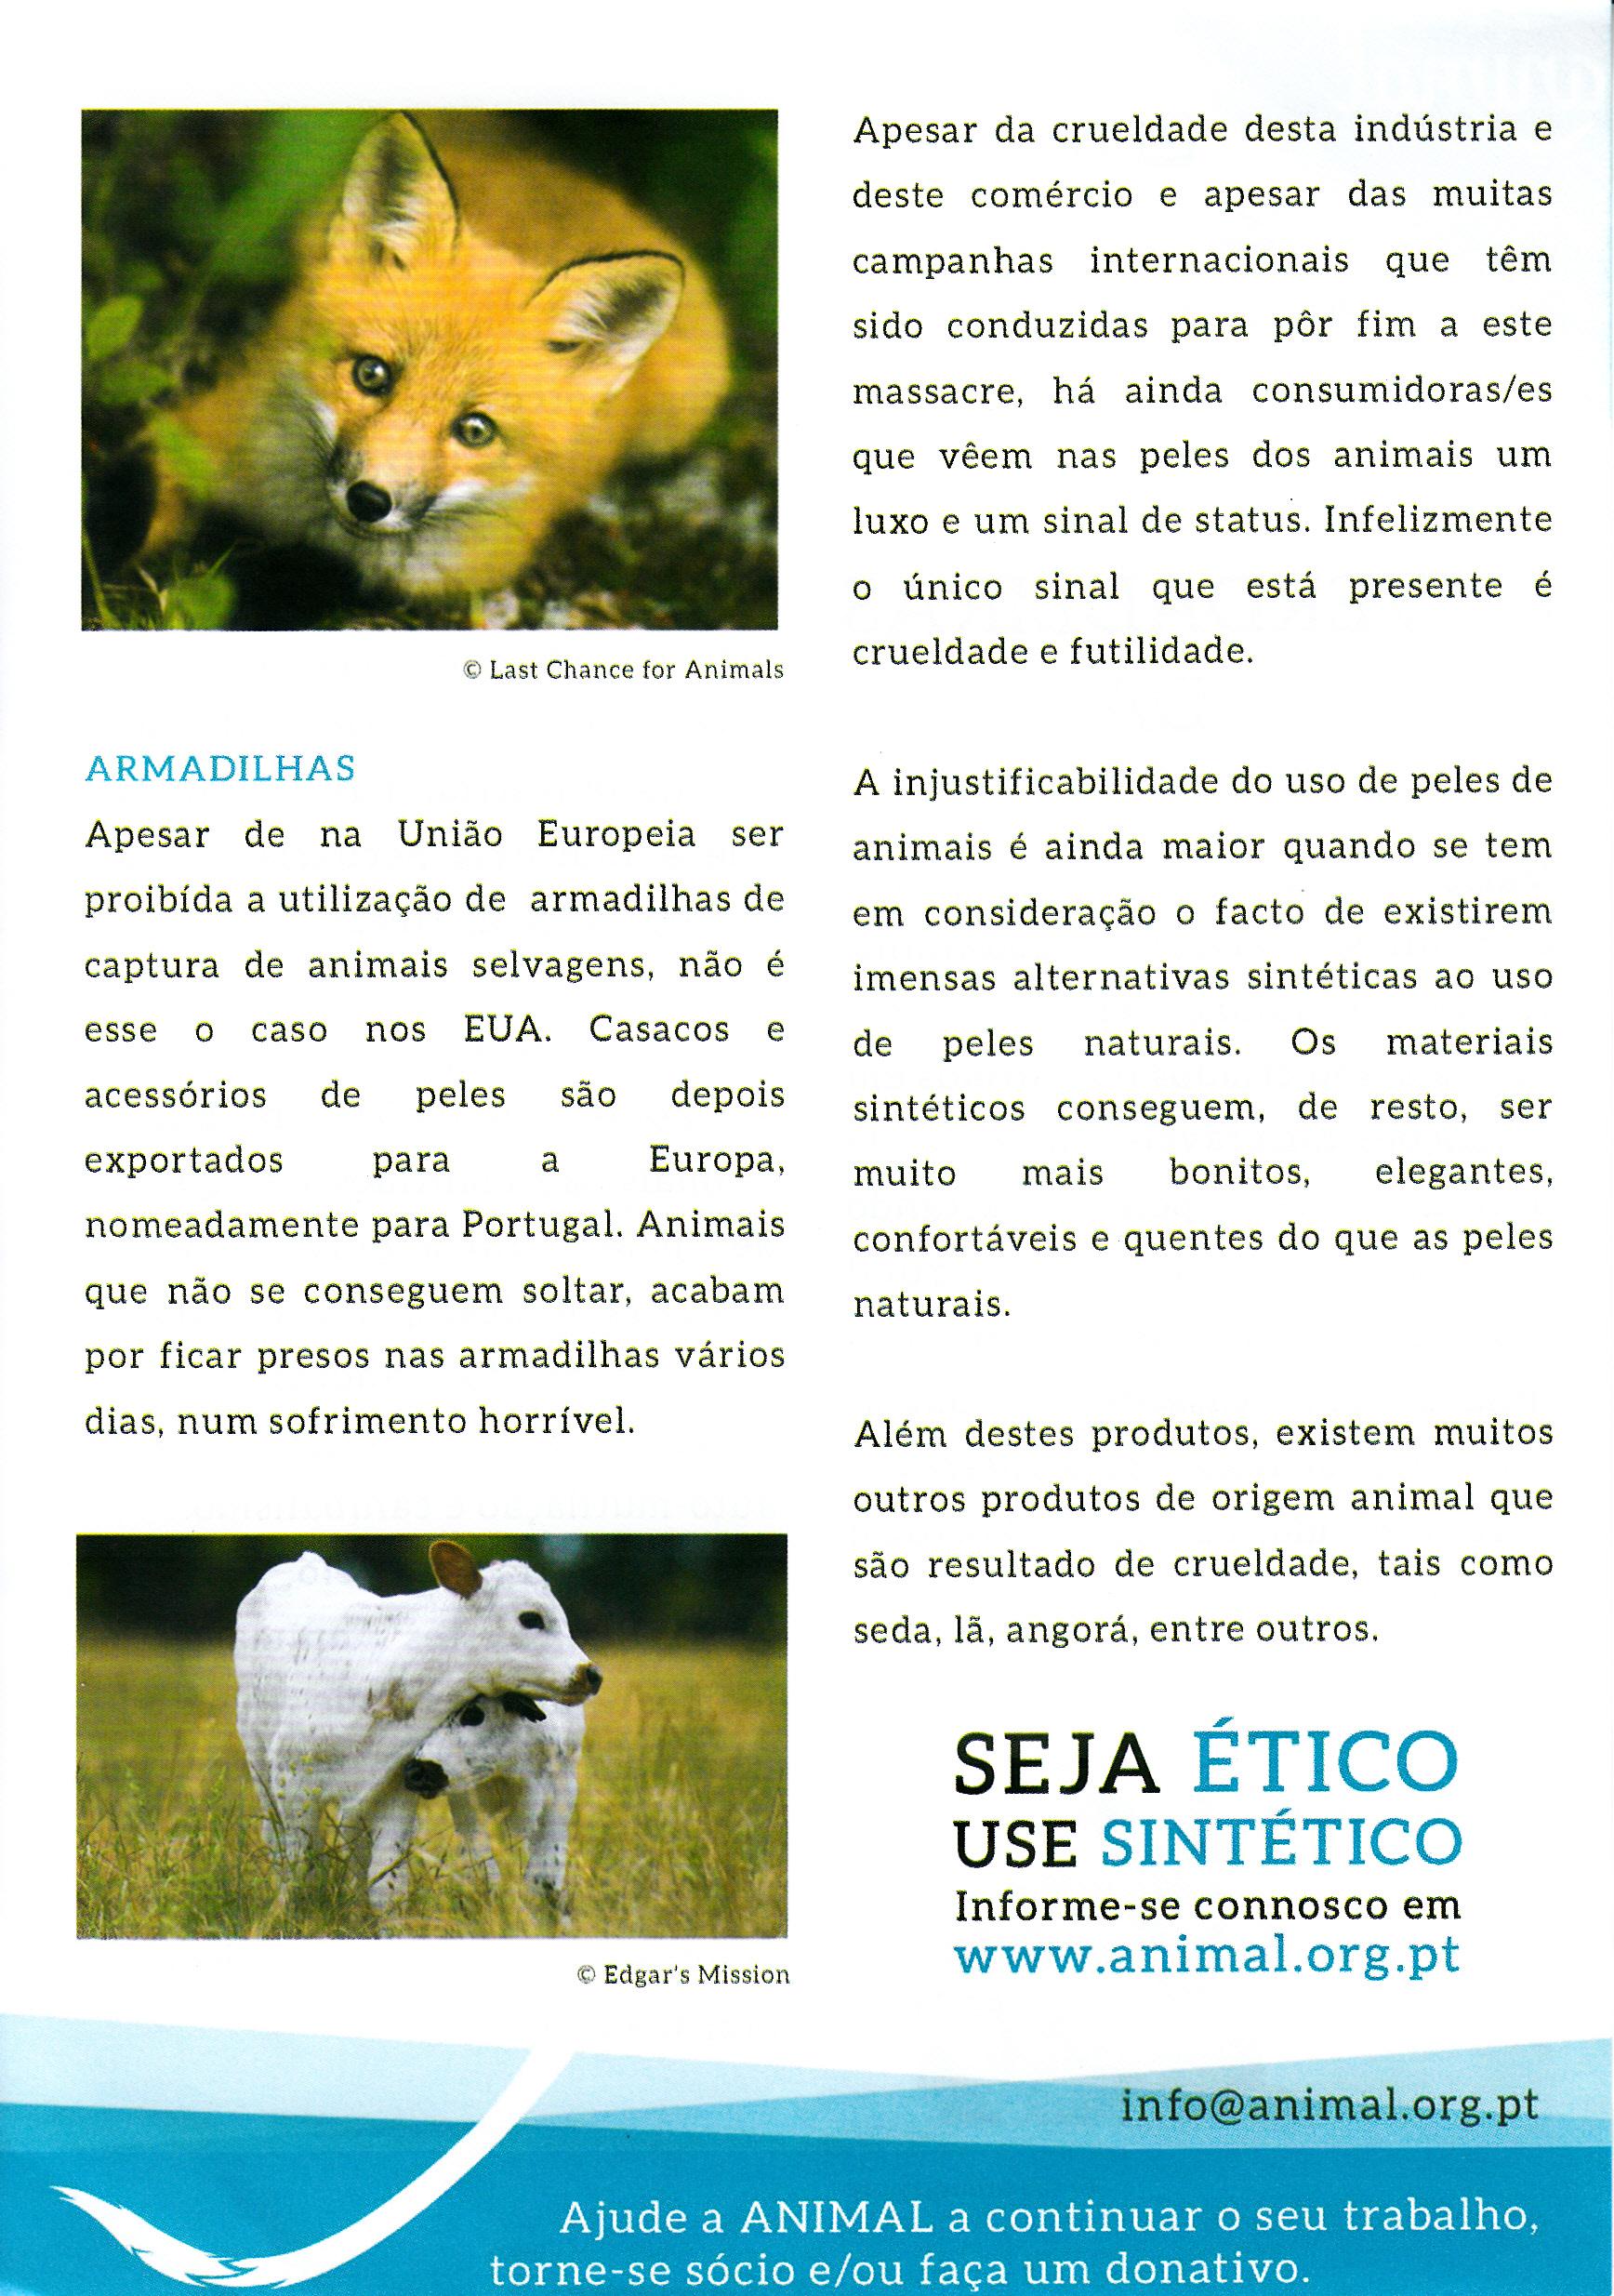 Animal_0008